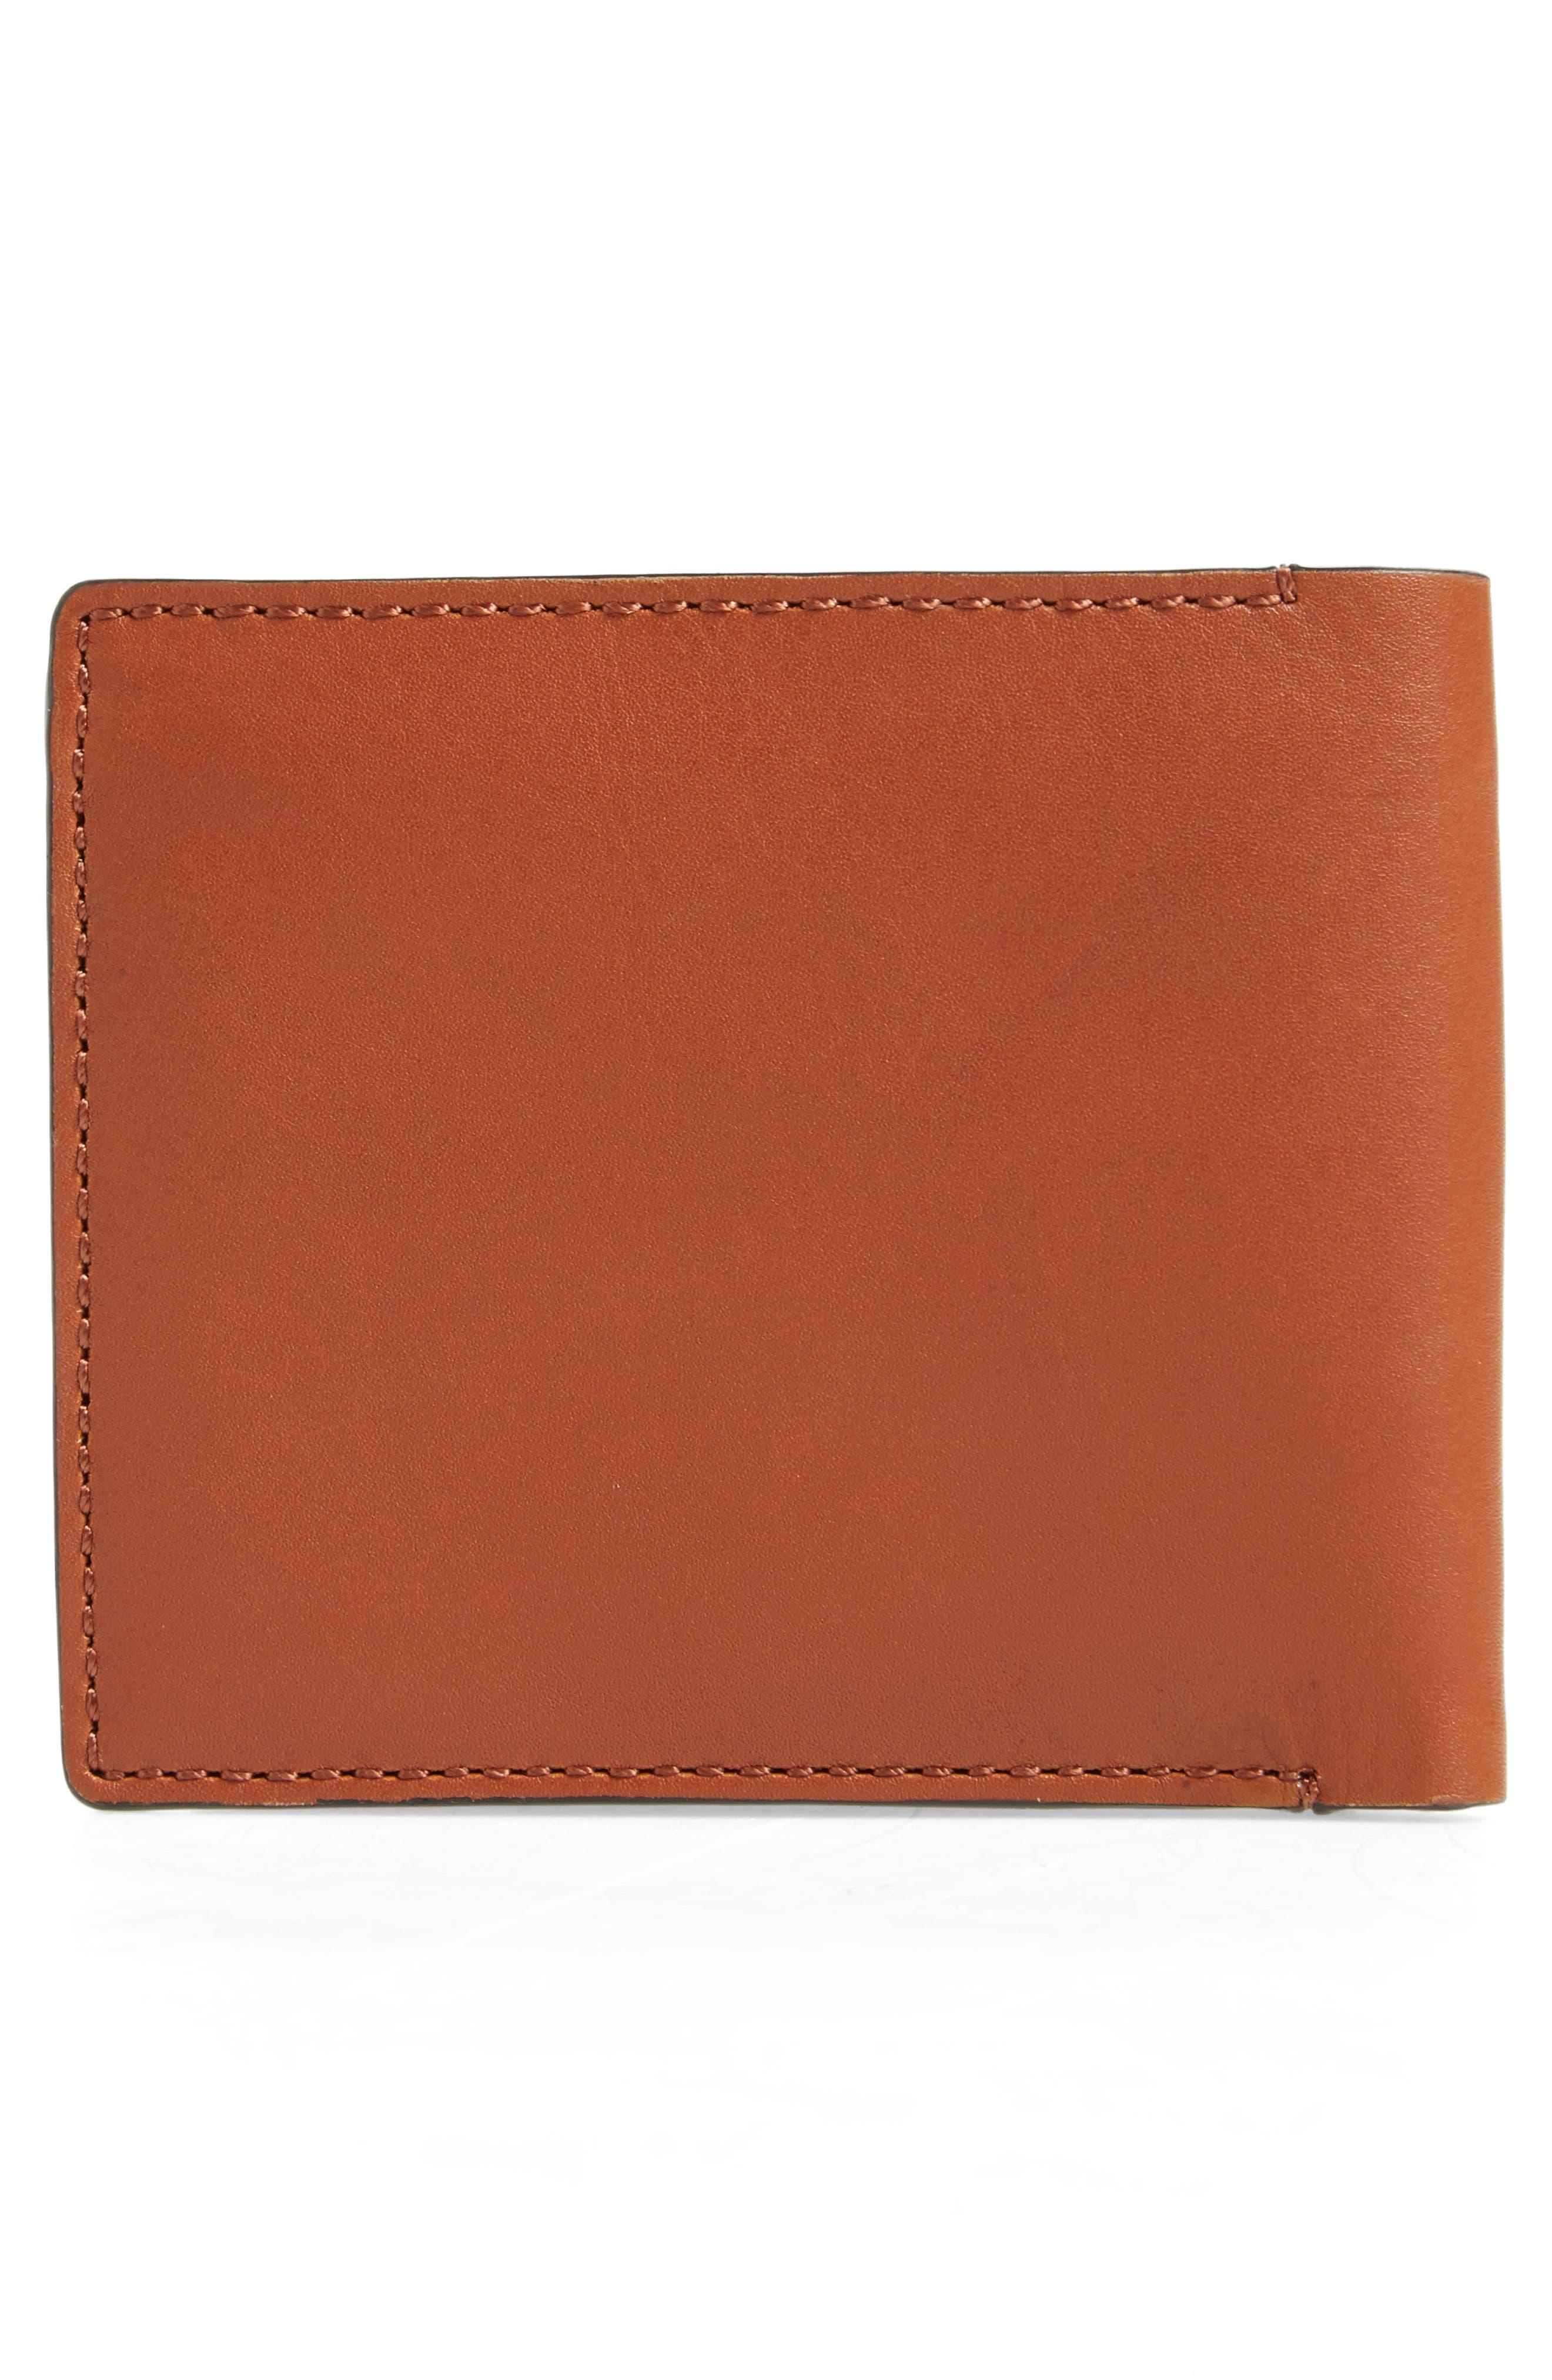 Washington Grand Wallet,                             Alternate thumbnail 6, color,